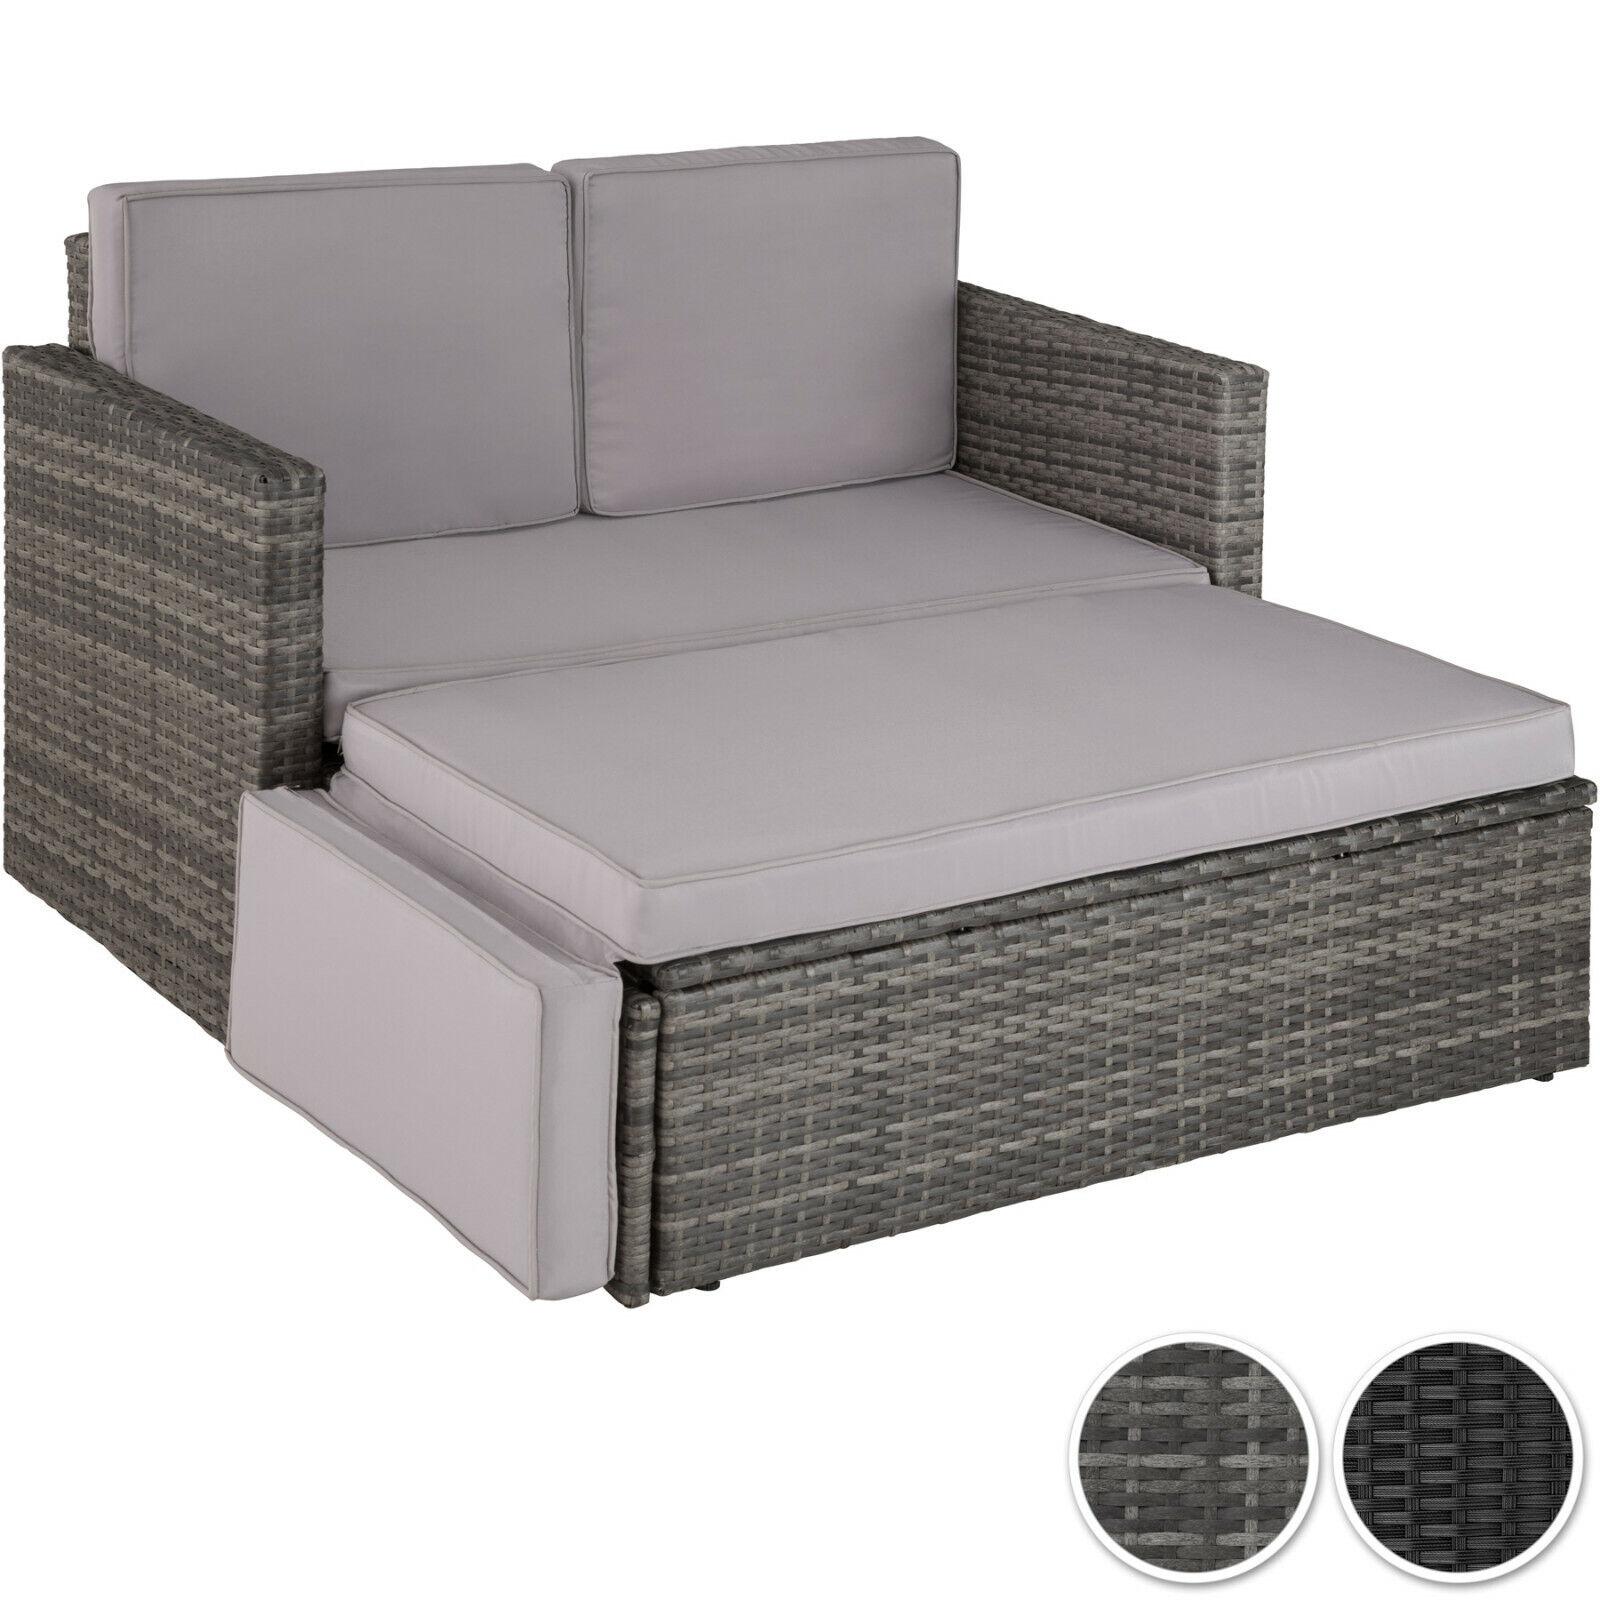 Poly Rattan Lounge Set Gartenmöbel Sitzgruppe Garten Sofa Couch Ottomane Hocker